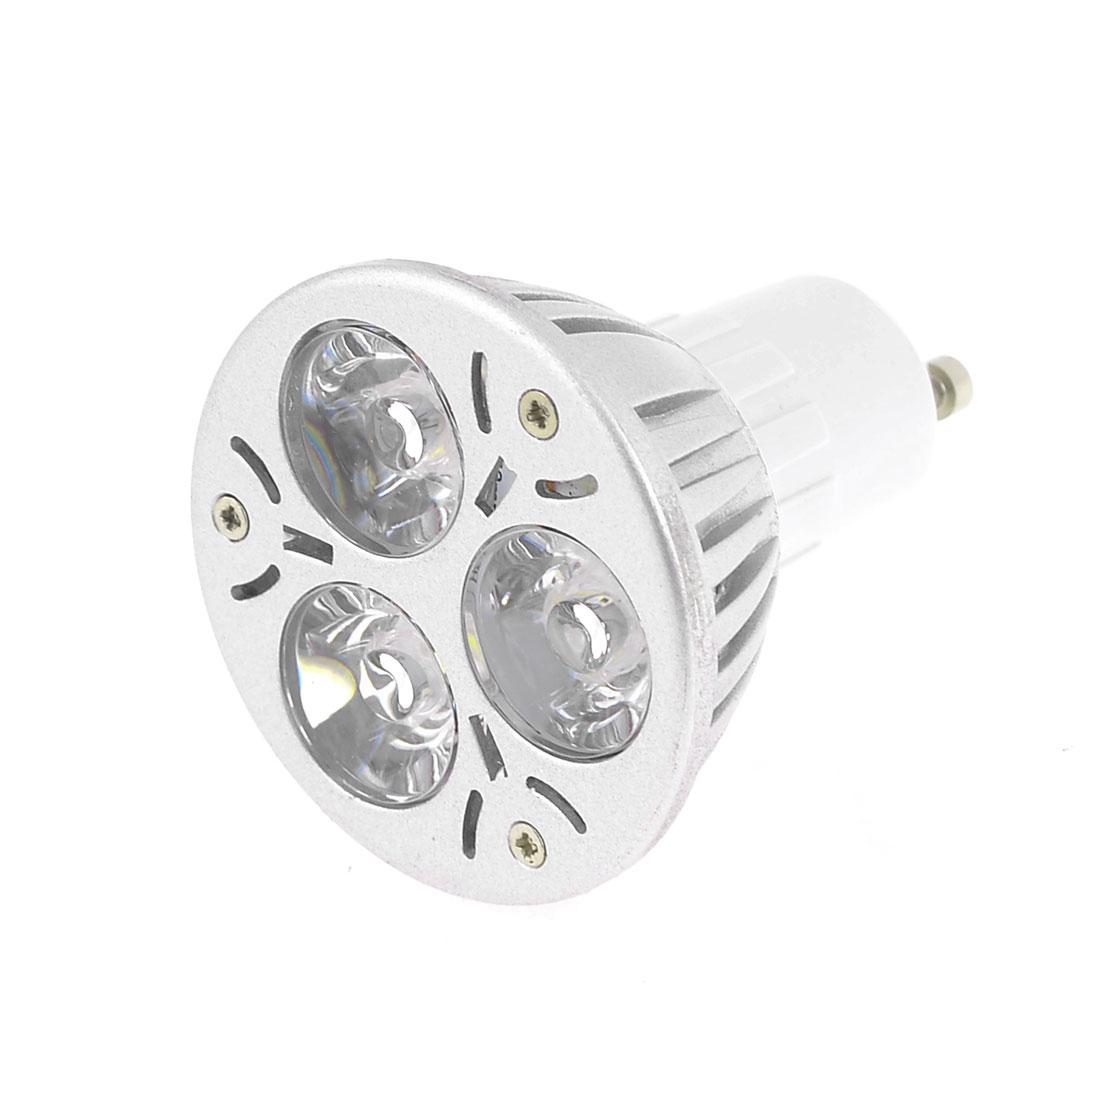 AC 12V 1W Warm White Lamp 3 LEDs Energy Saving GU10 Light Bulb